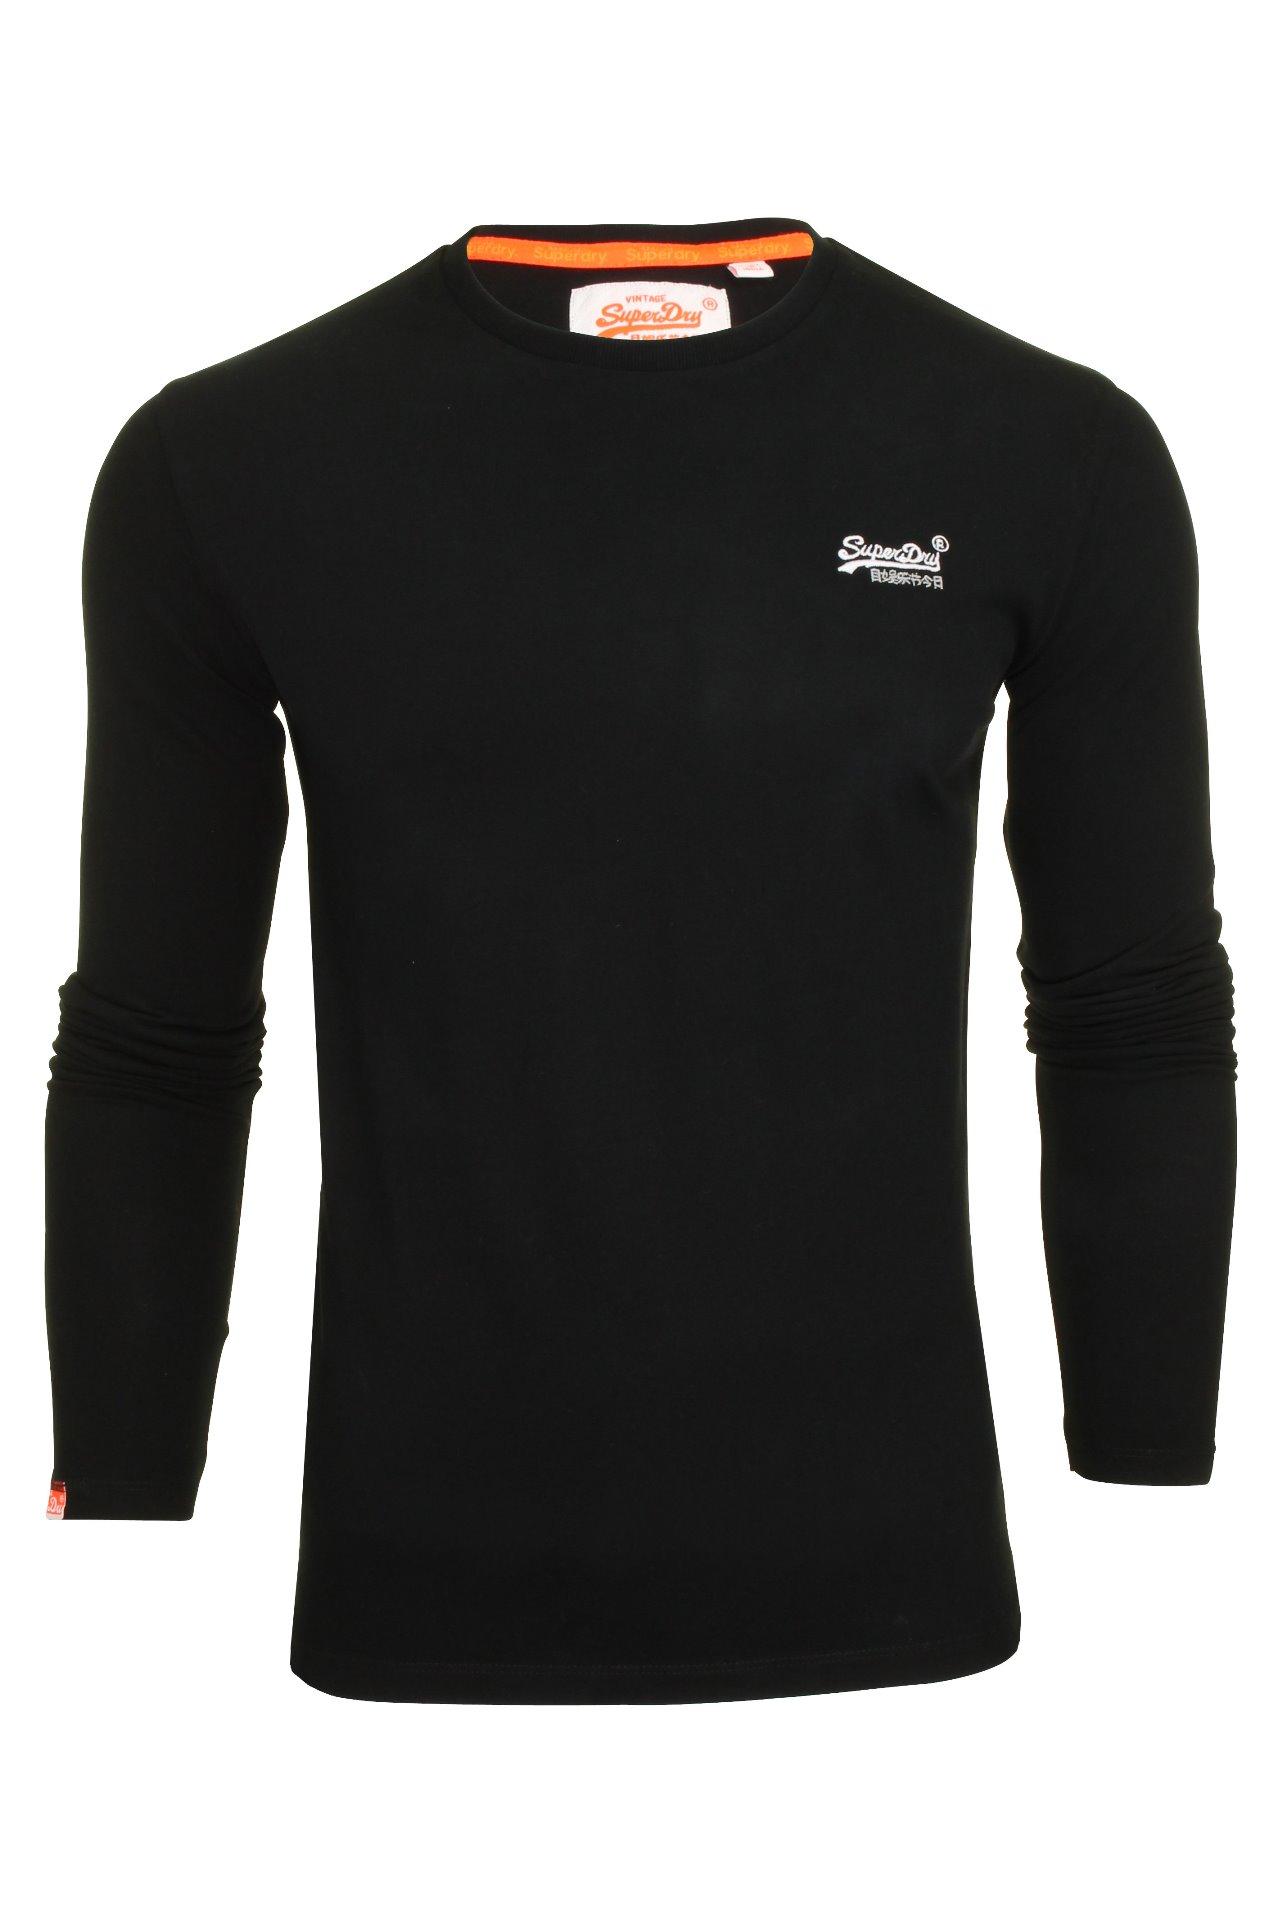 Flash Sale Bodybuilding Gym 7xl Beast Mode Vest Gym Gaul Rrp £14.99 black